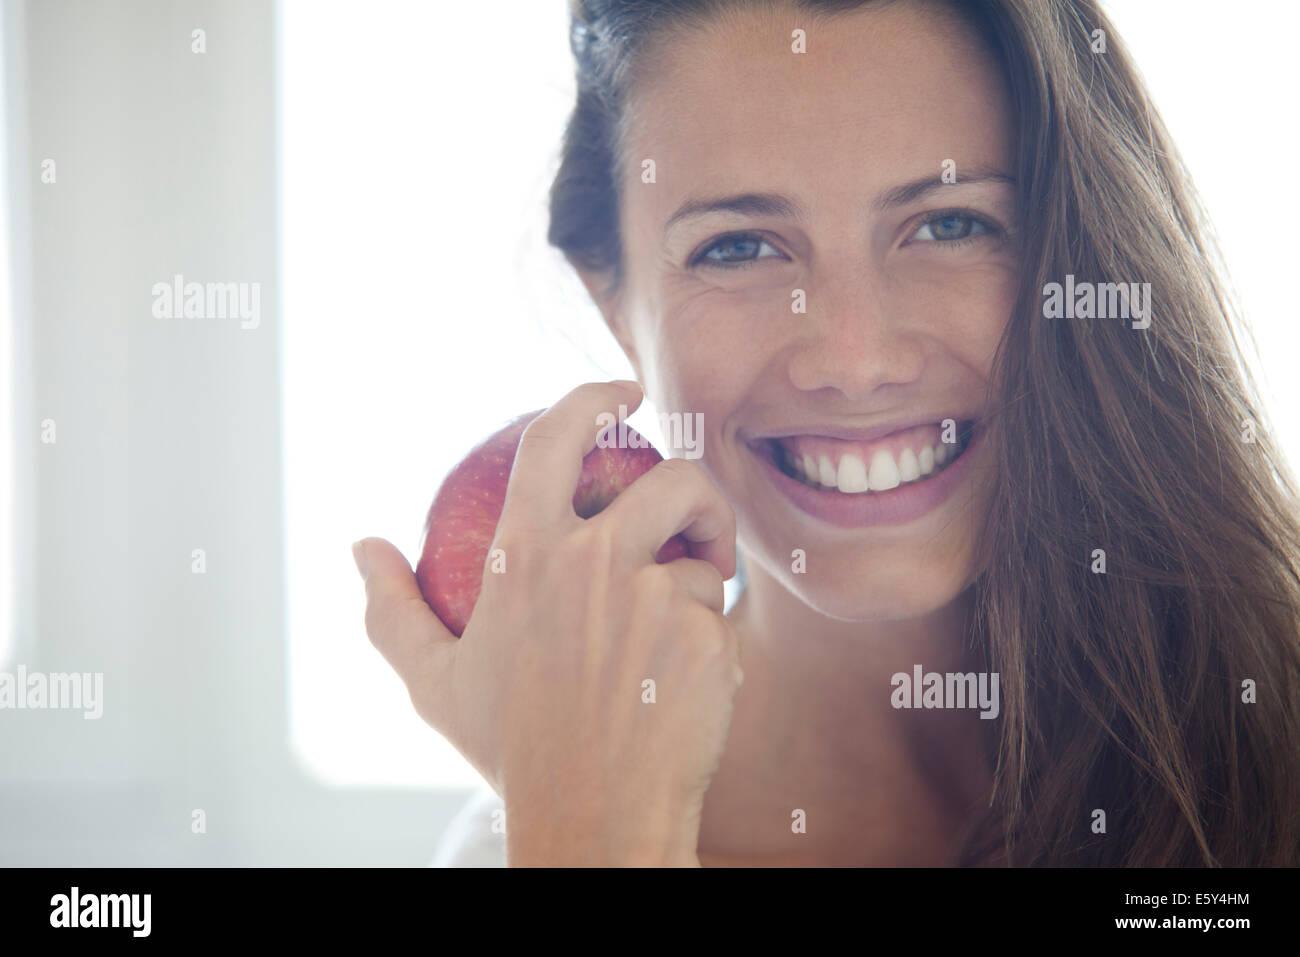 Mujer sosteniendo apple, Retrato Imagen De Stock